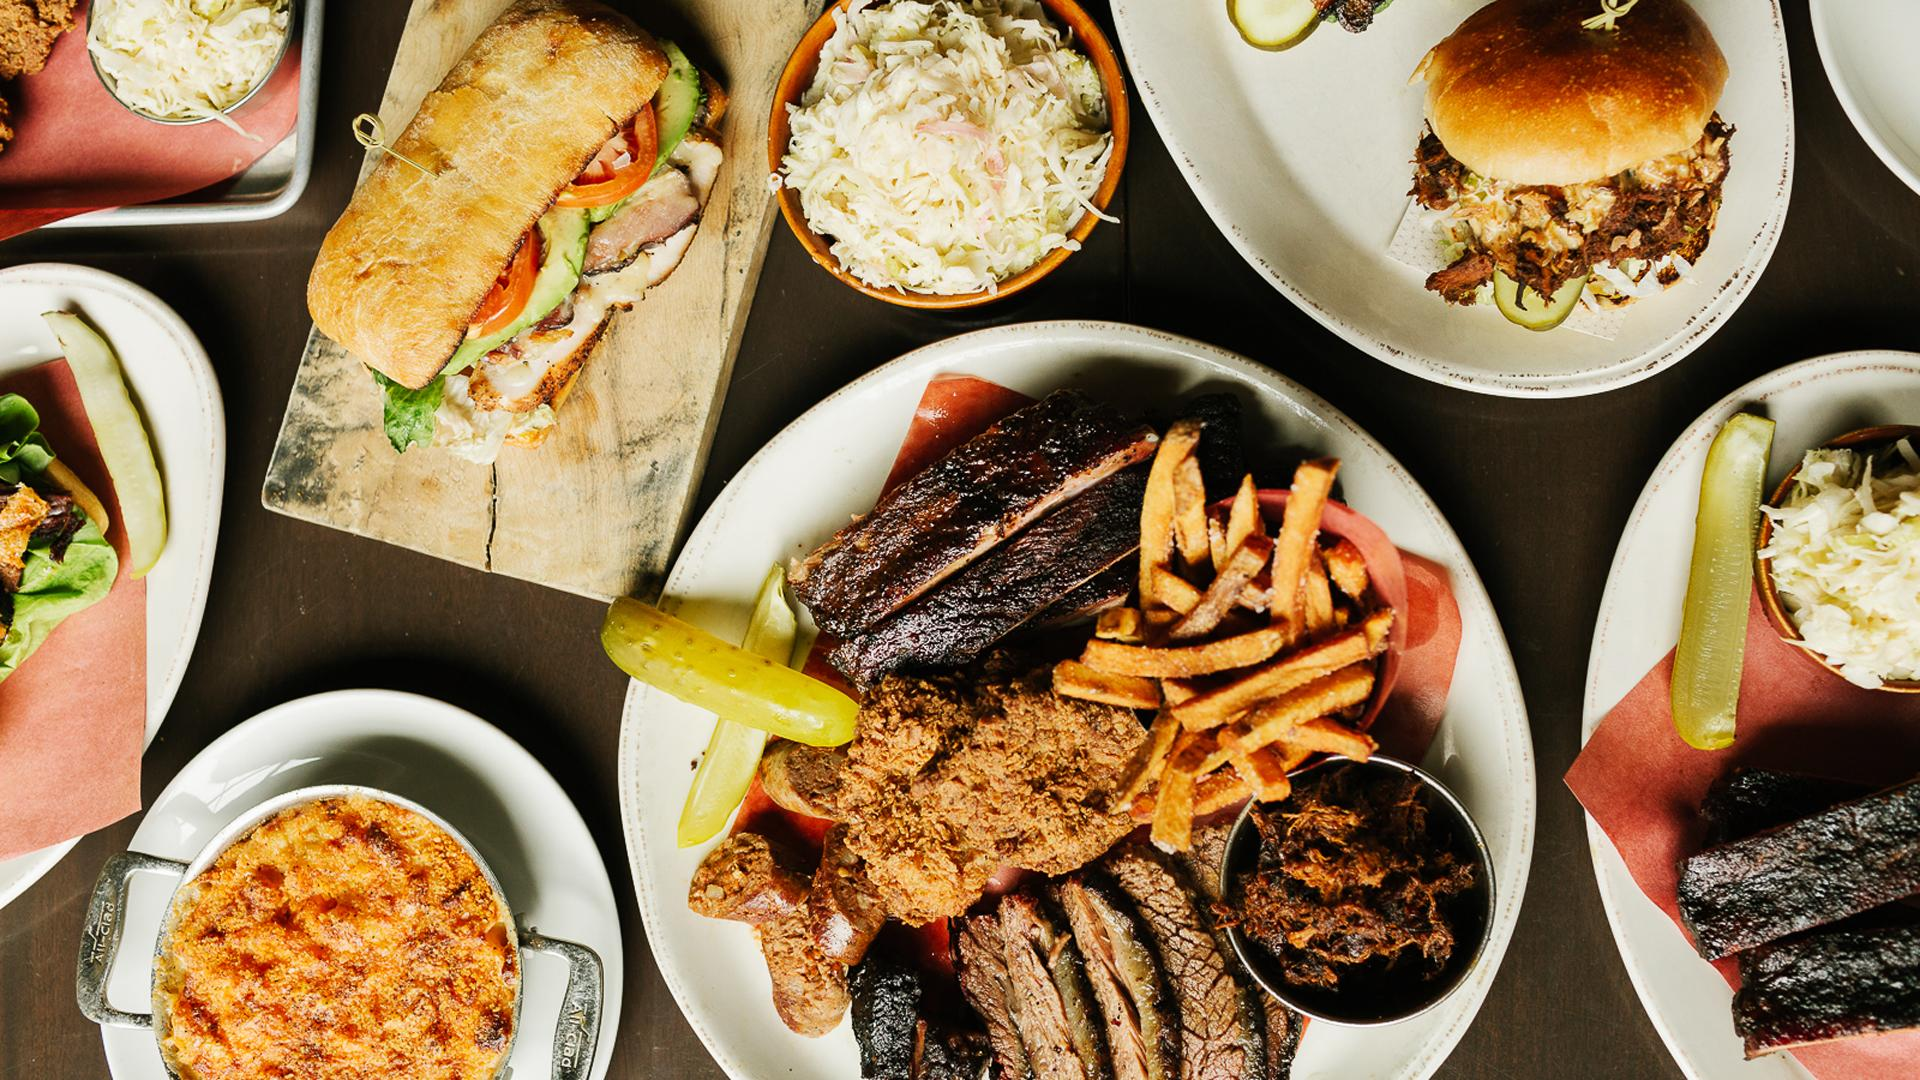 The best BBQ restaurants in Toronto: The Carbon Bar